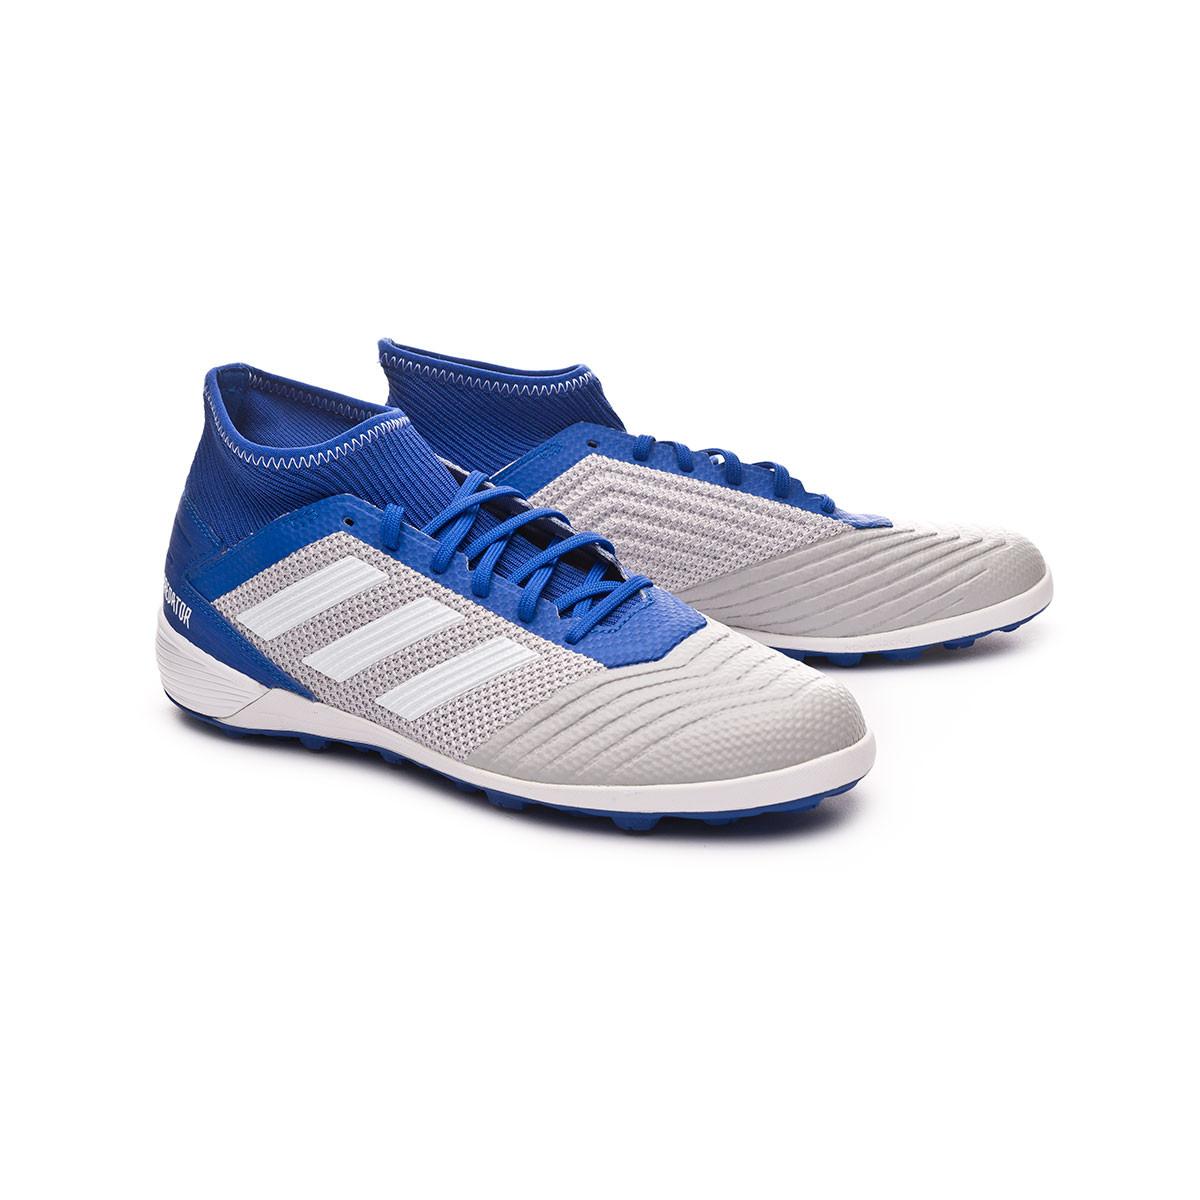 Klutesneakers | Adidas Predator Tango 19.3 Turf Soccer Shoes